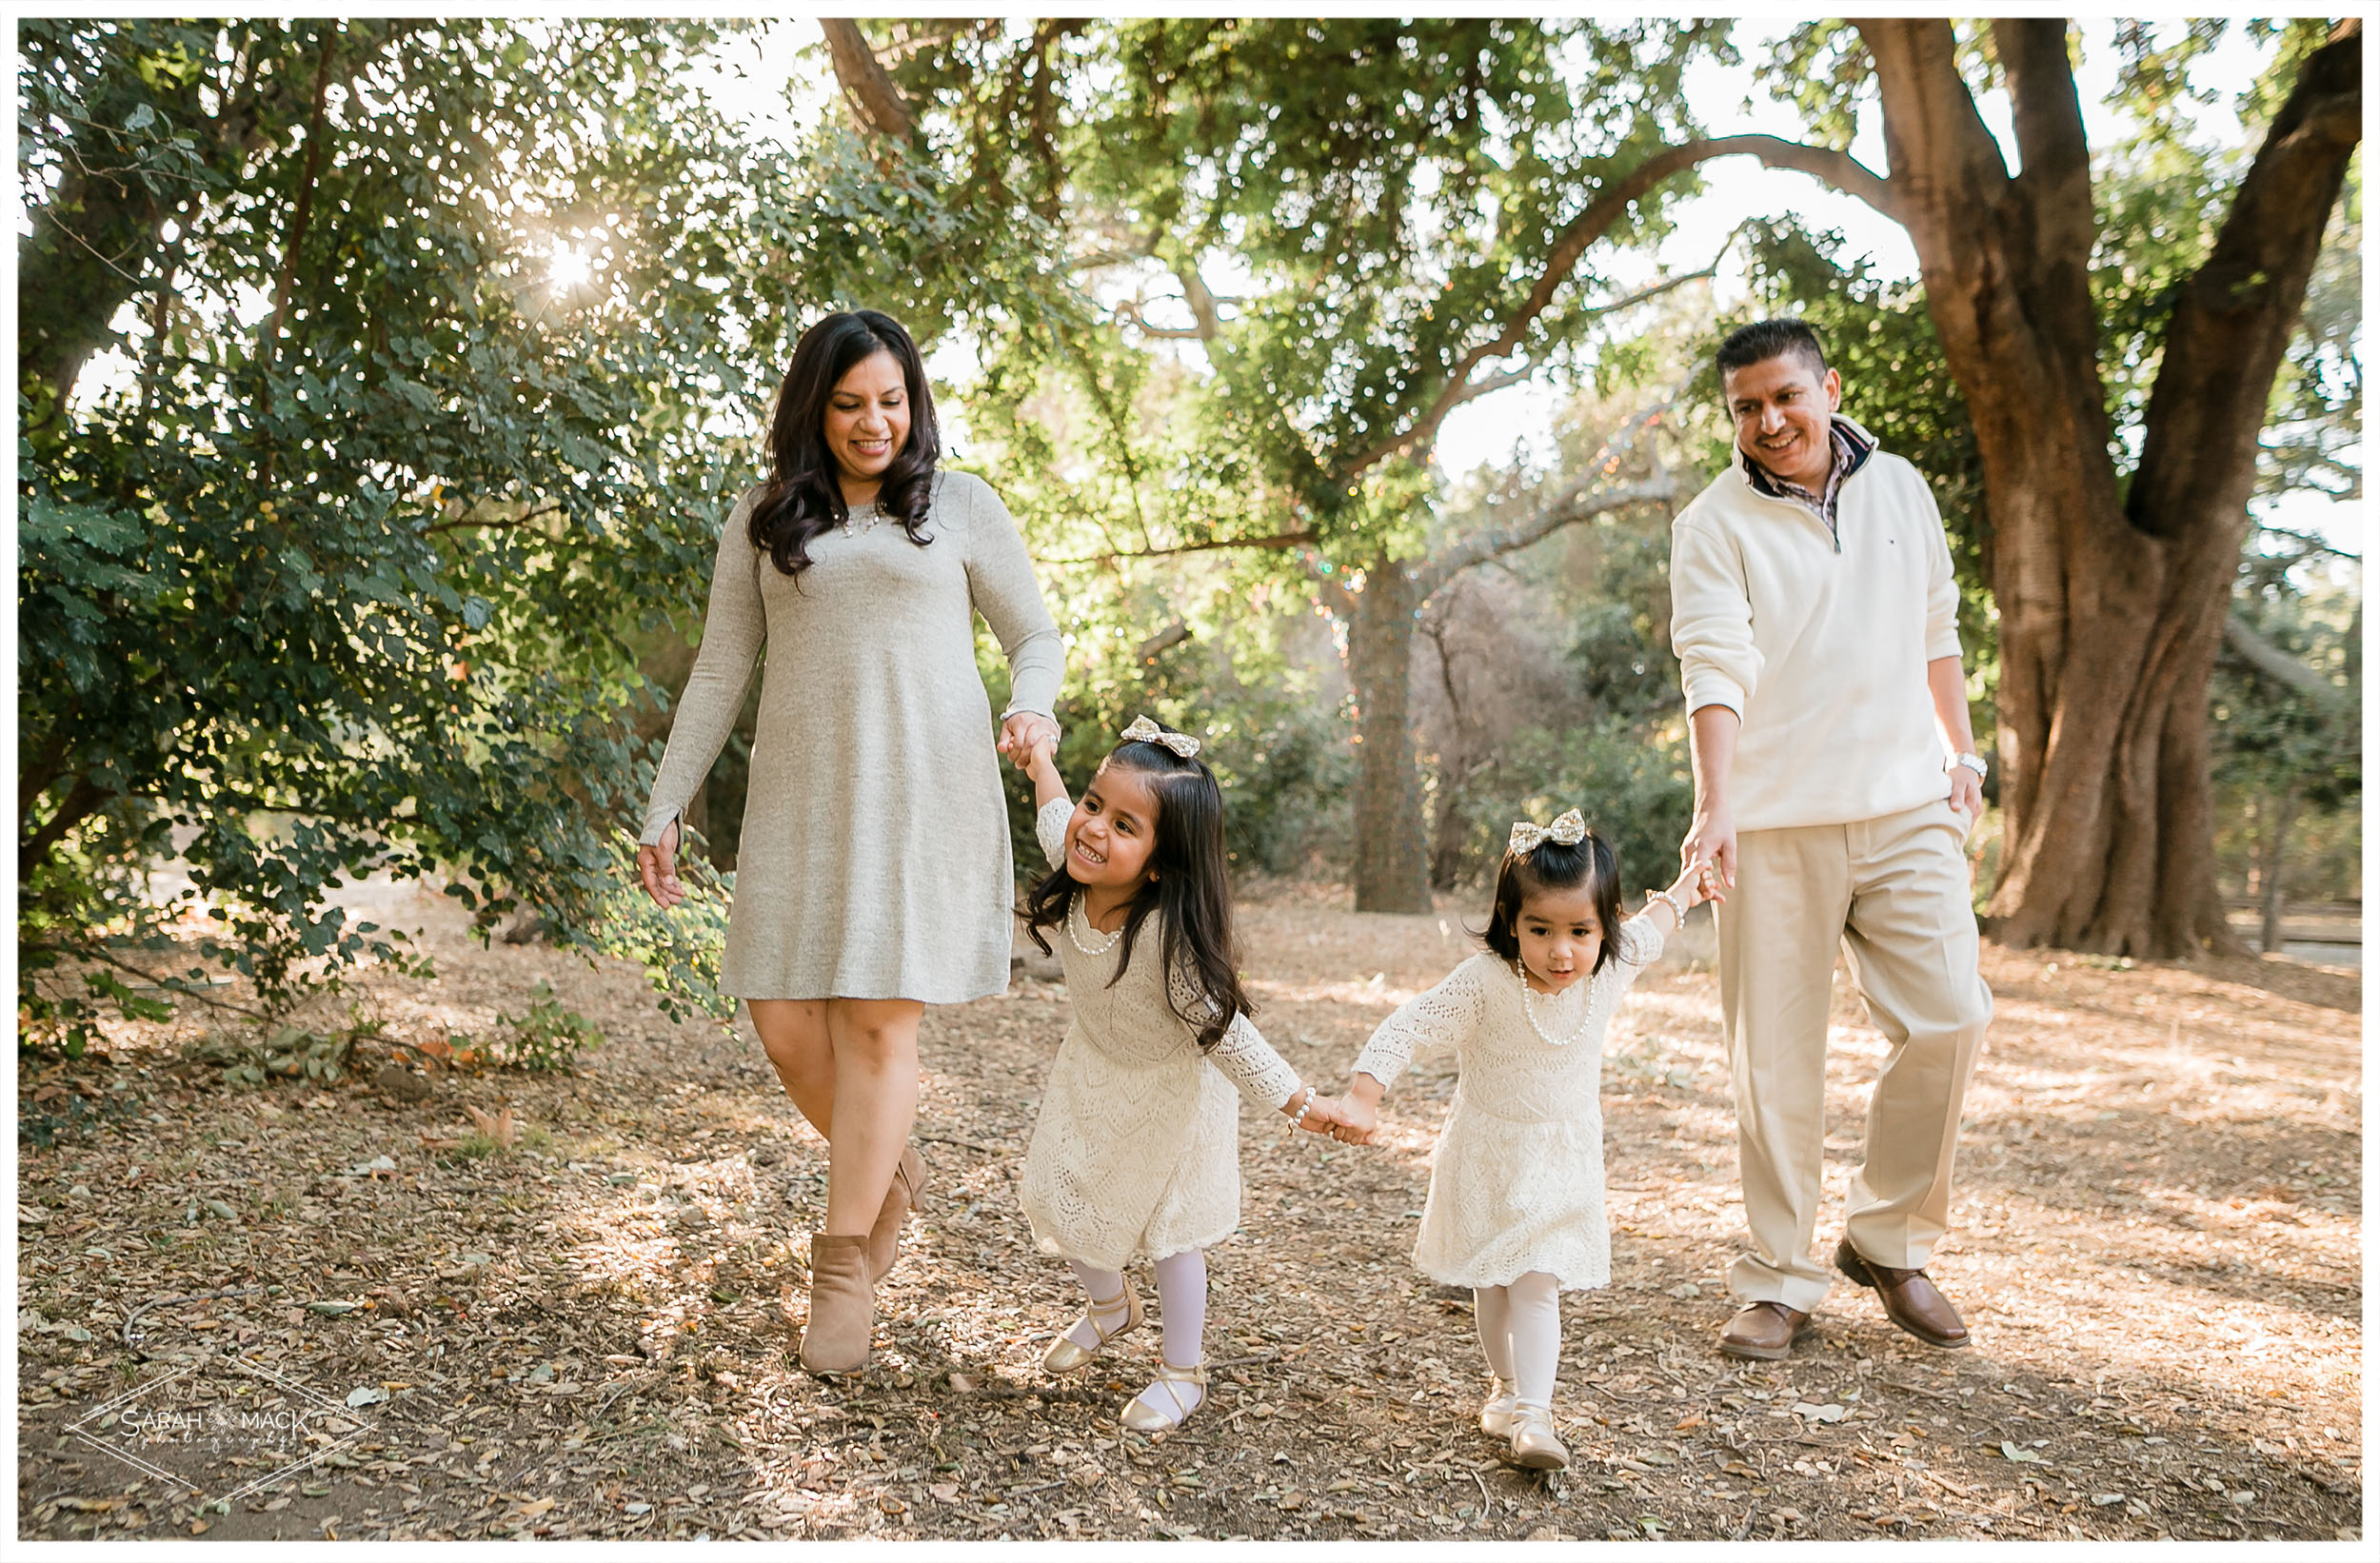 m-irvine-regional-family-portrait-photography-7.jpg